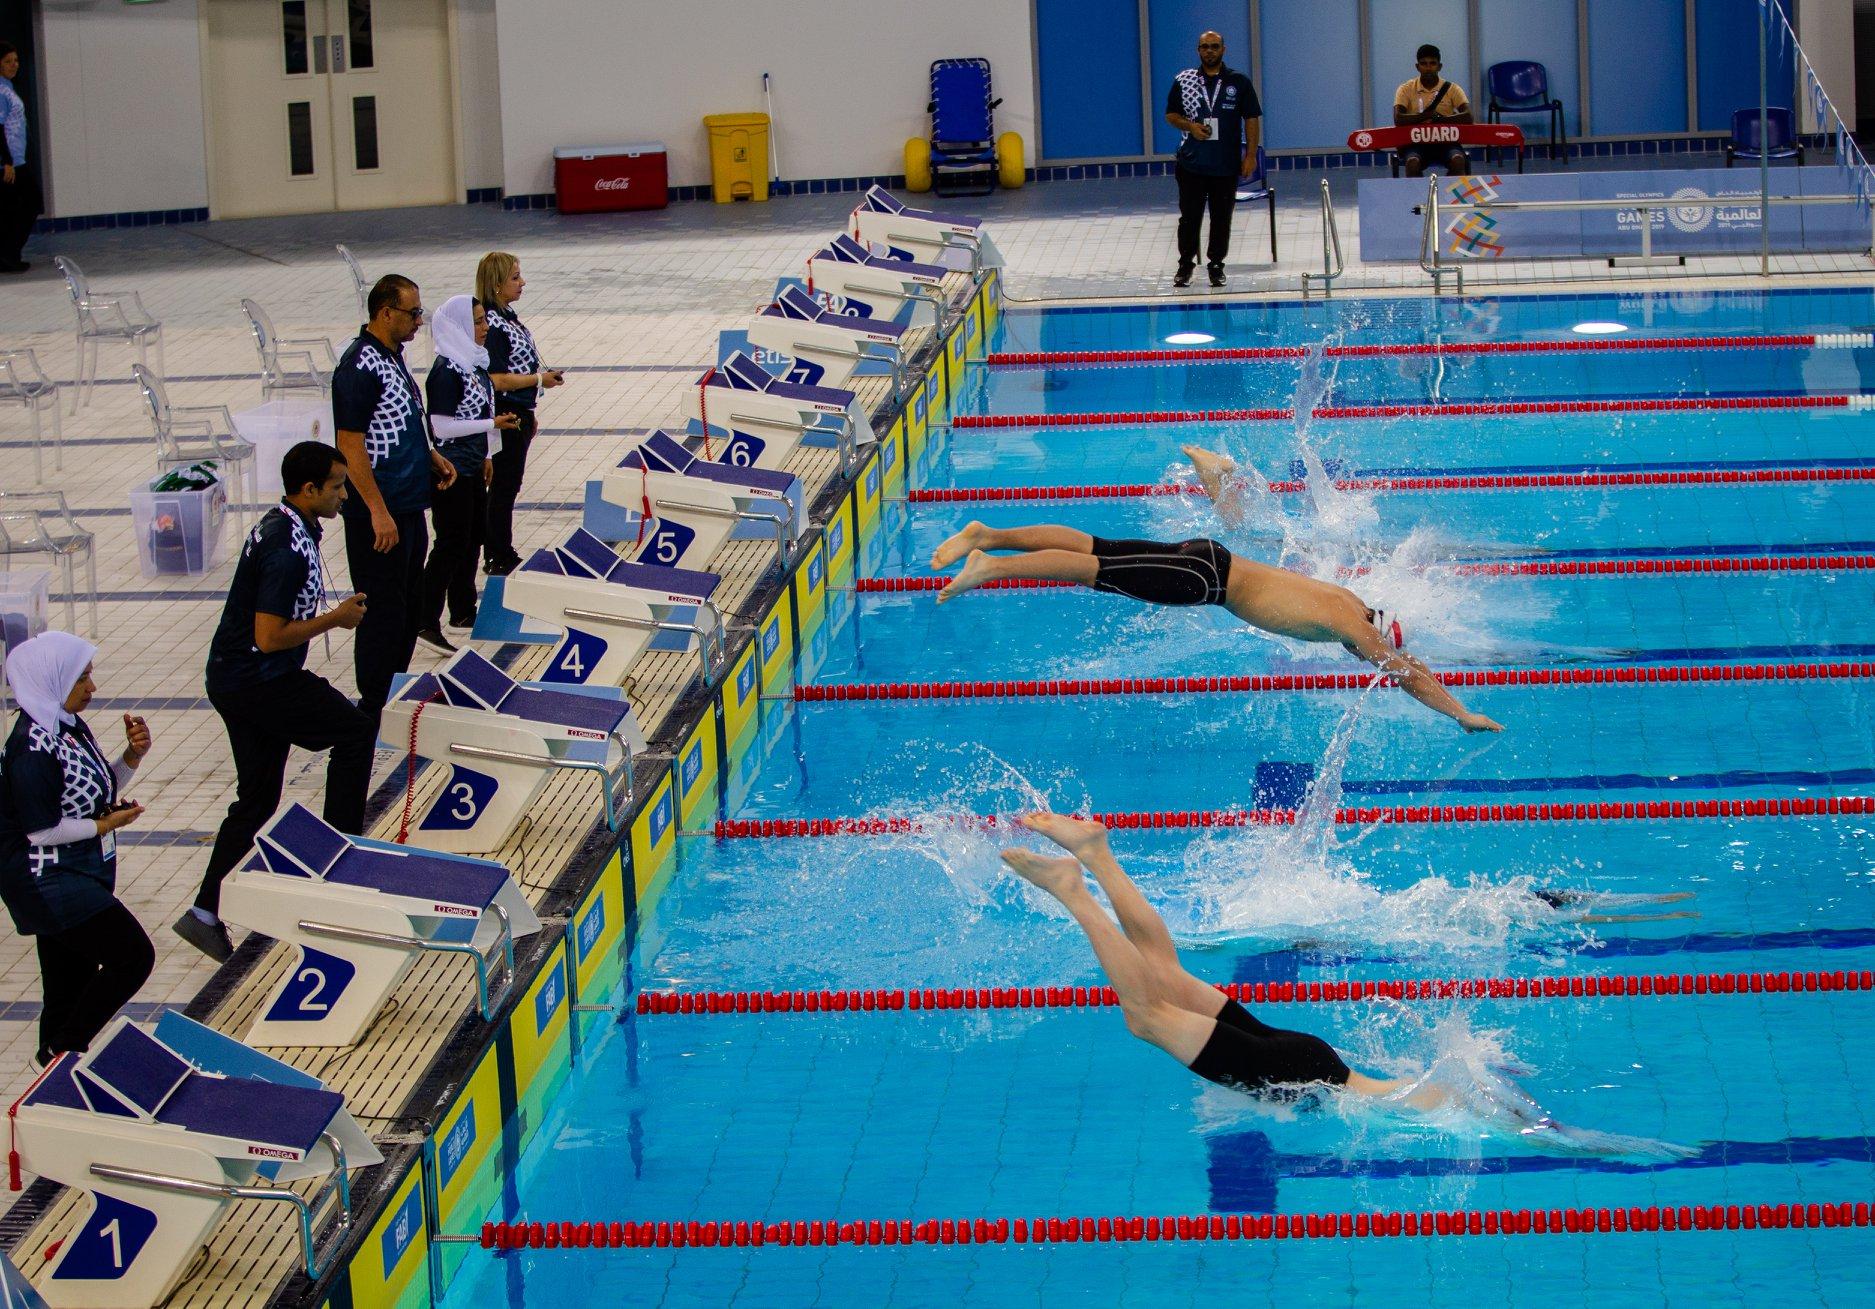 Day 3 - Hamdan Sports Complex